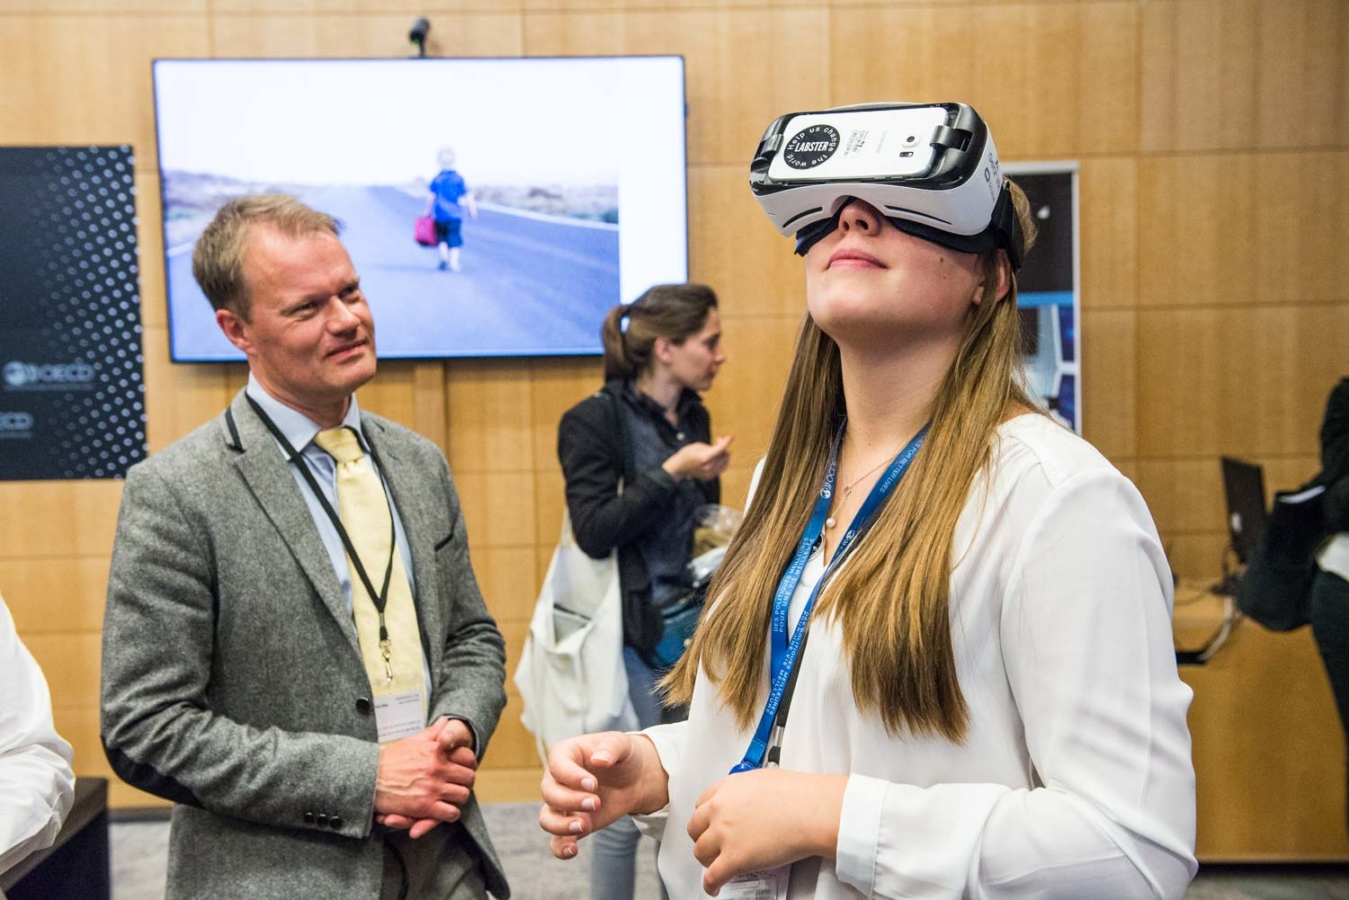 6 June 2017 - OECD Forum 2017. Virtual Reality Demonstrations. OECD, Paris, France.Photo: OECD/Hubert  Raguet